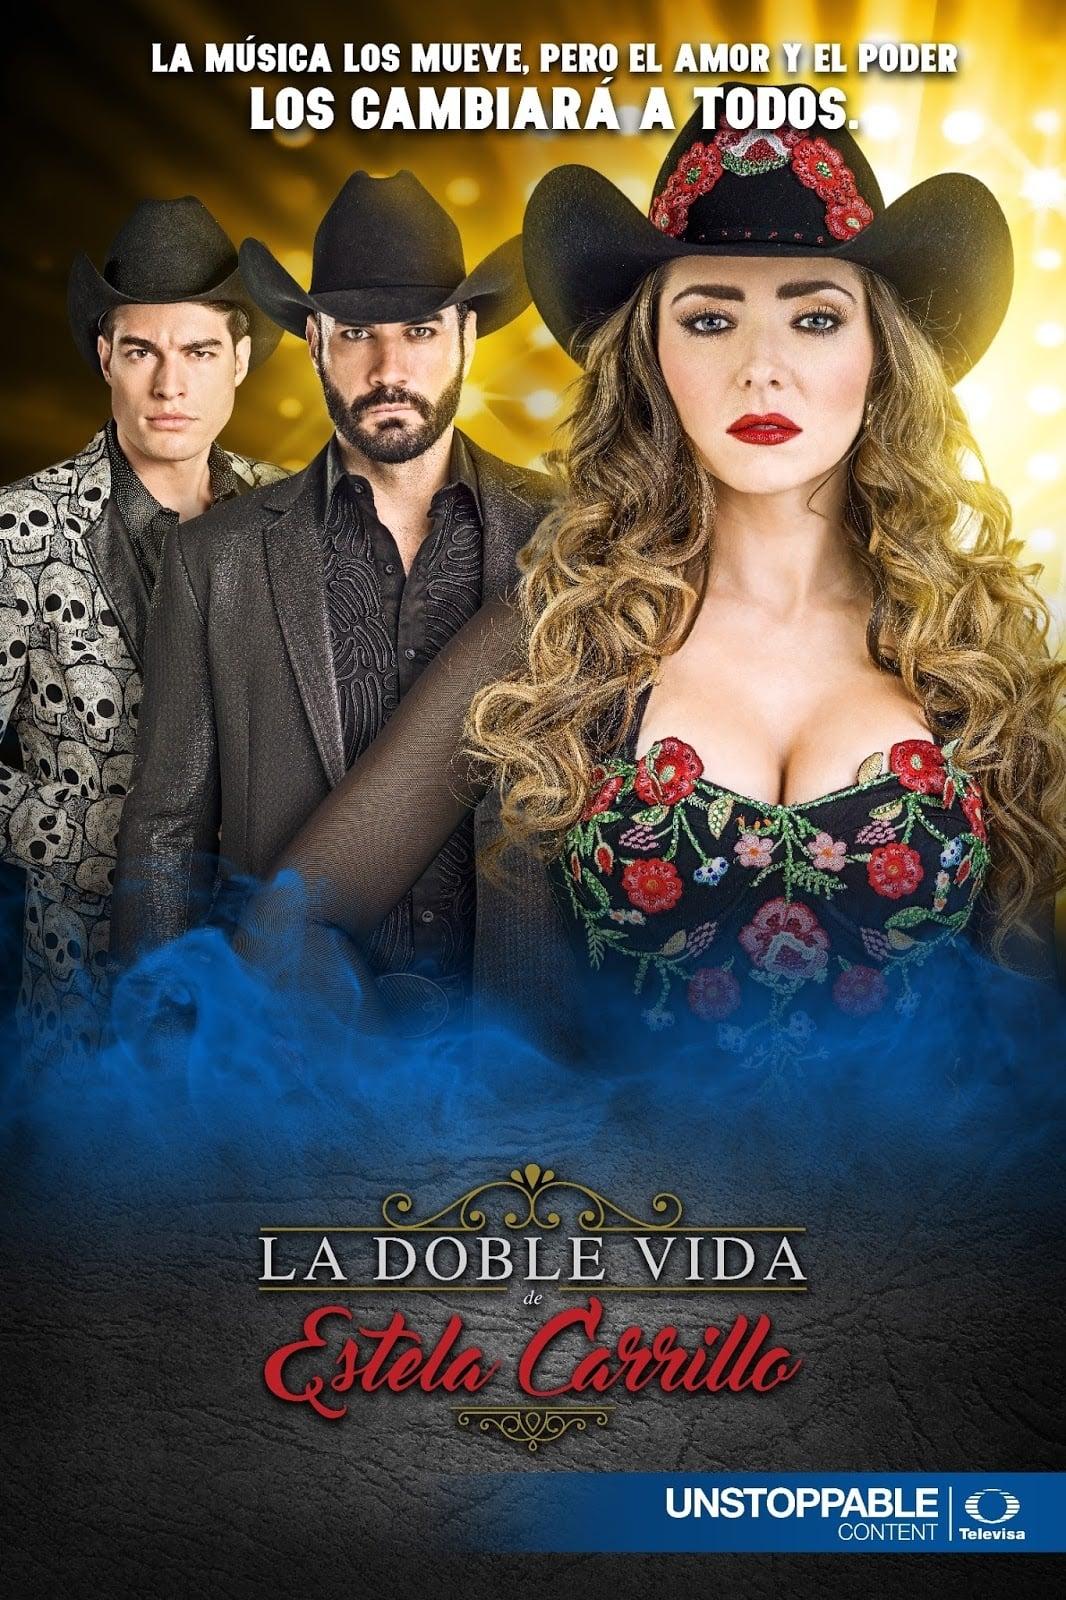 La doble vida de Estela Carrillo poster